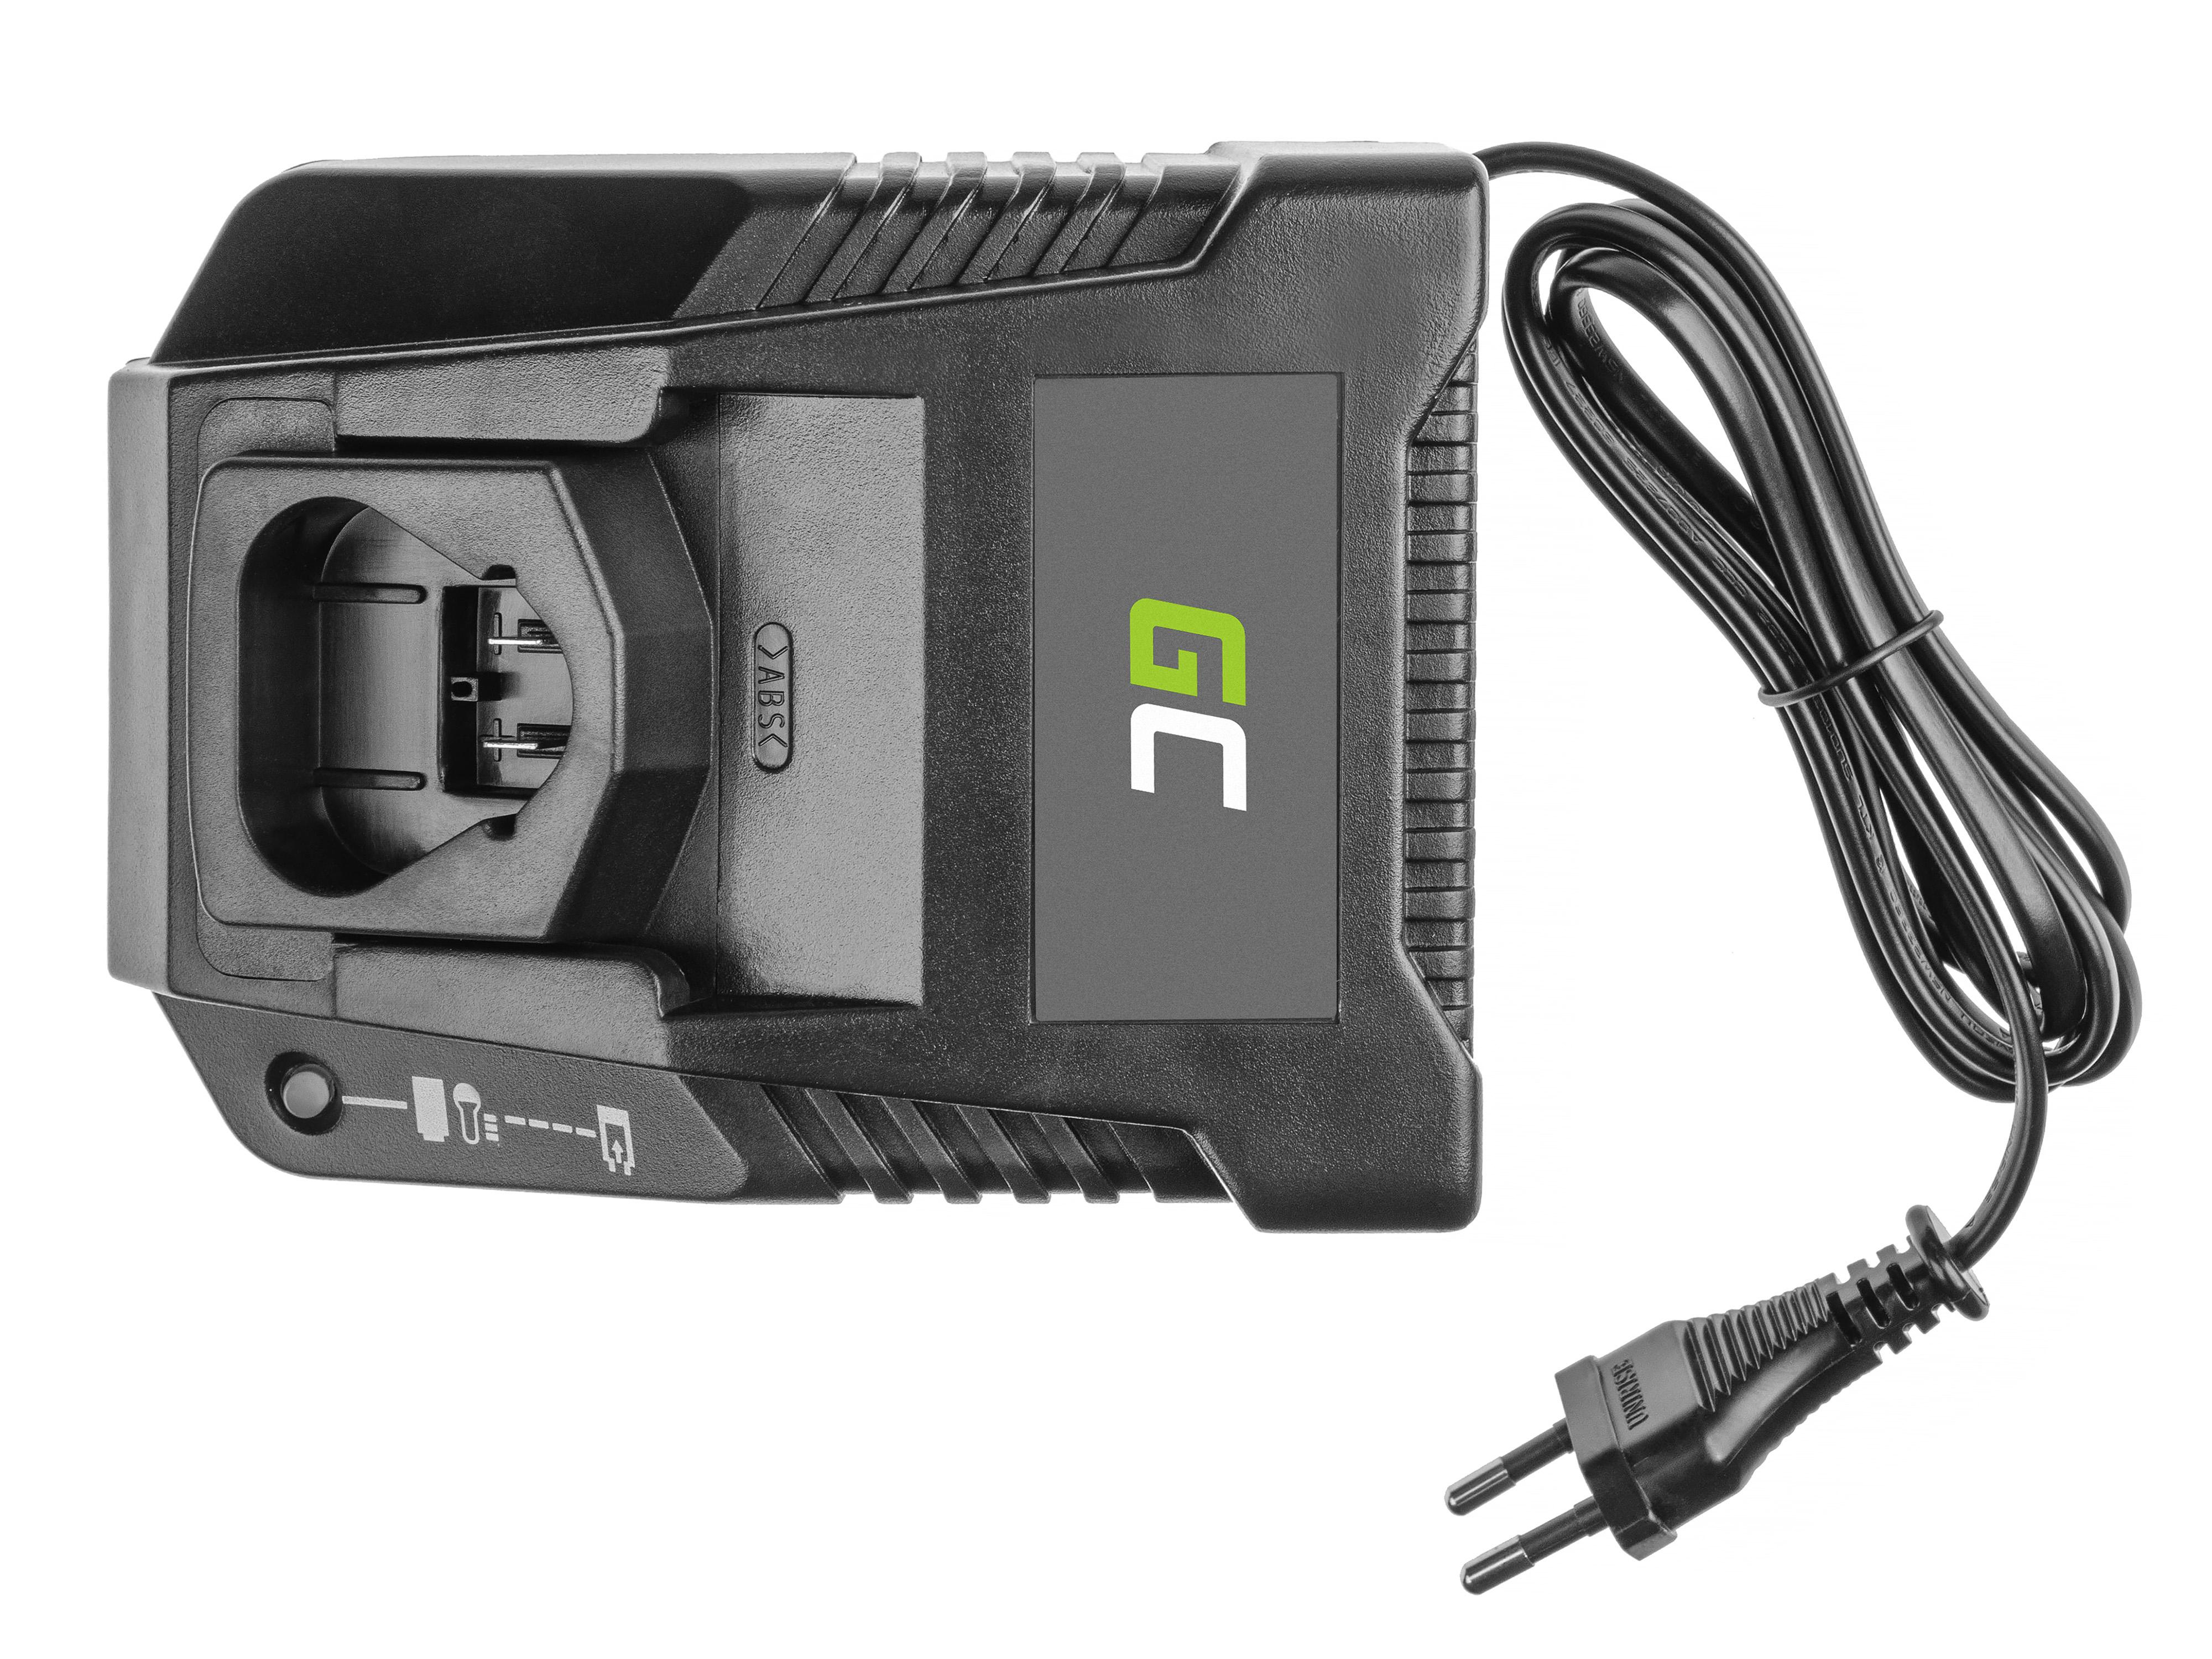 Green Cell ® Power Tool Battery Charger SFC-7/18 for Hilti Ni-MH/Ni-CD SF120A SFB120 SFB123 SFB125 SID121 TCD12